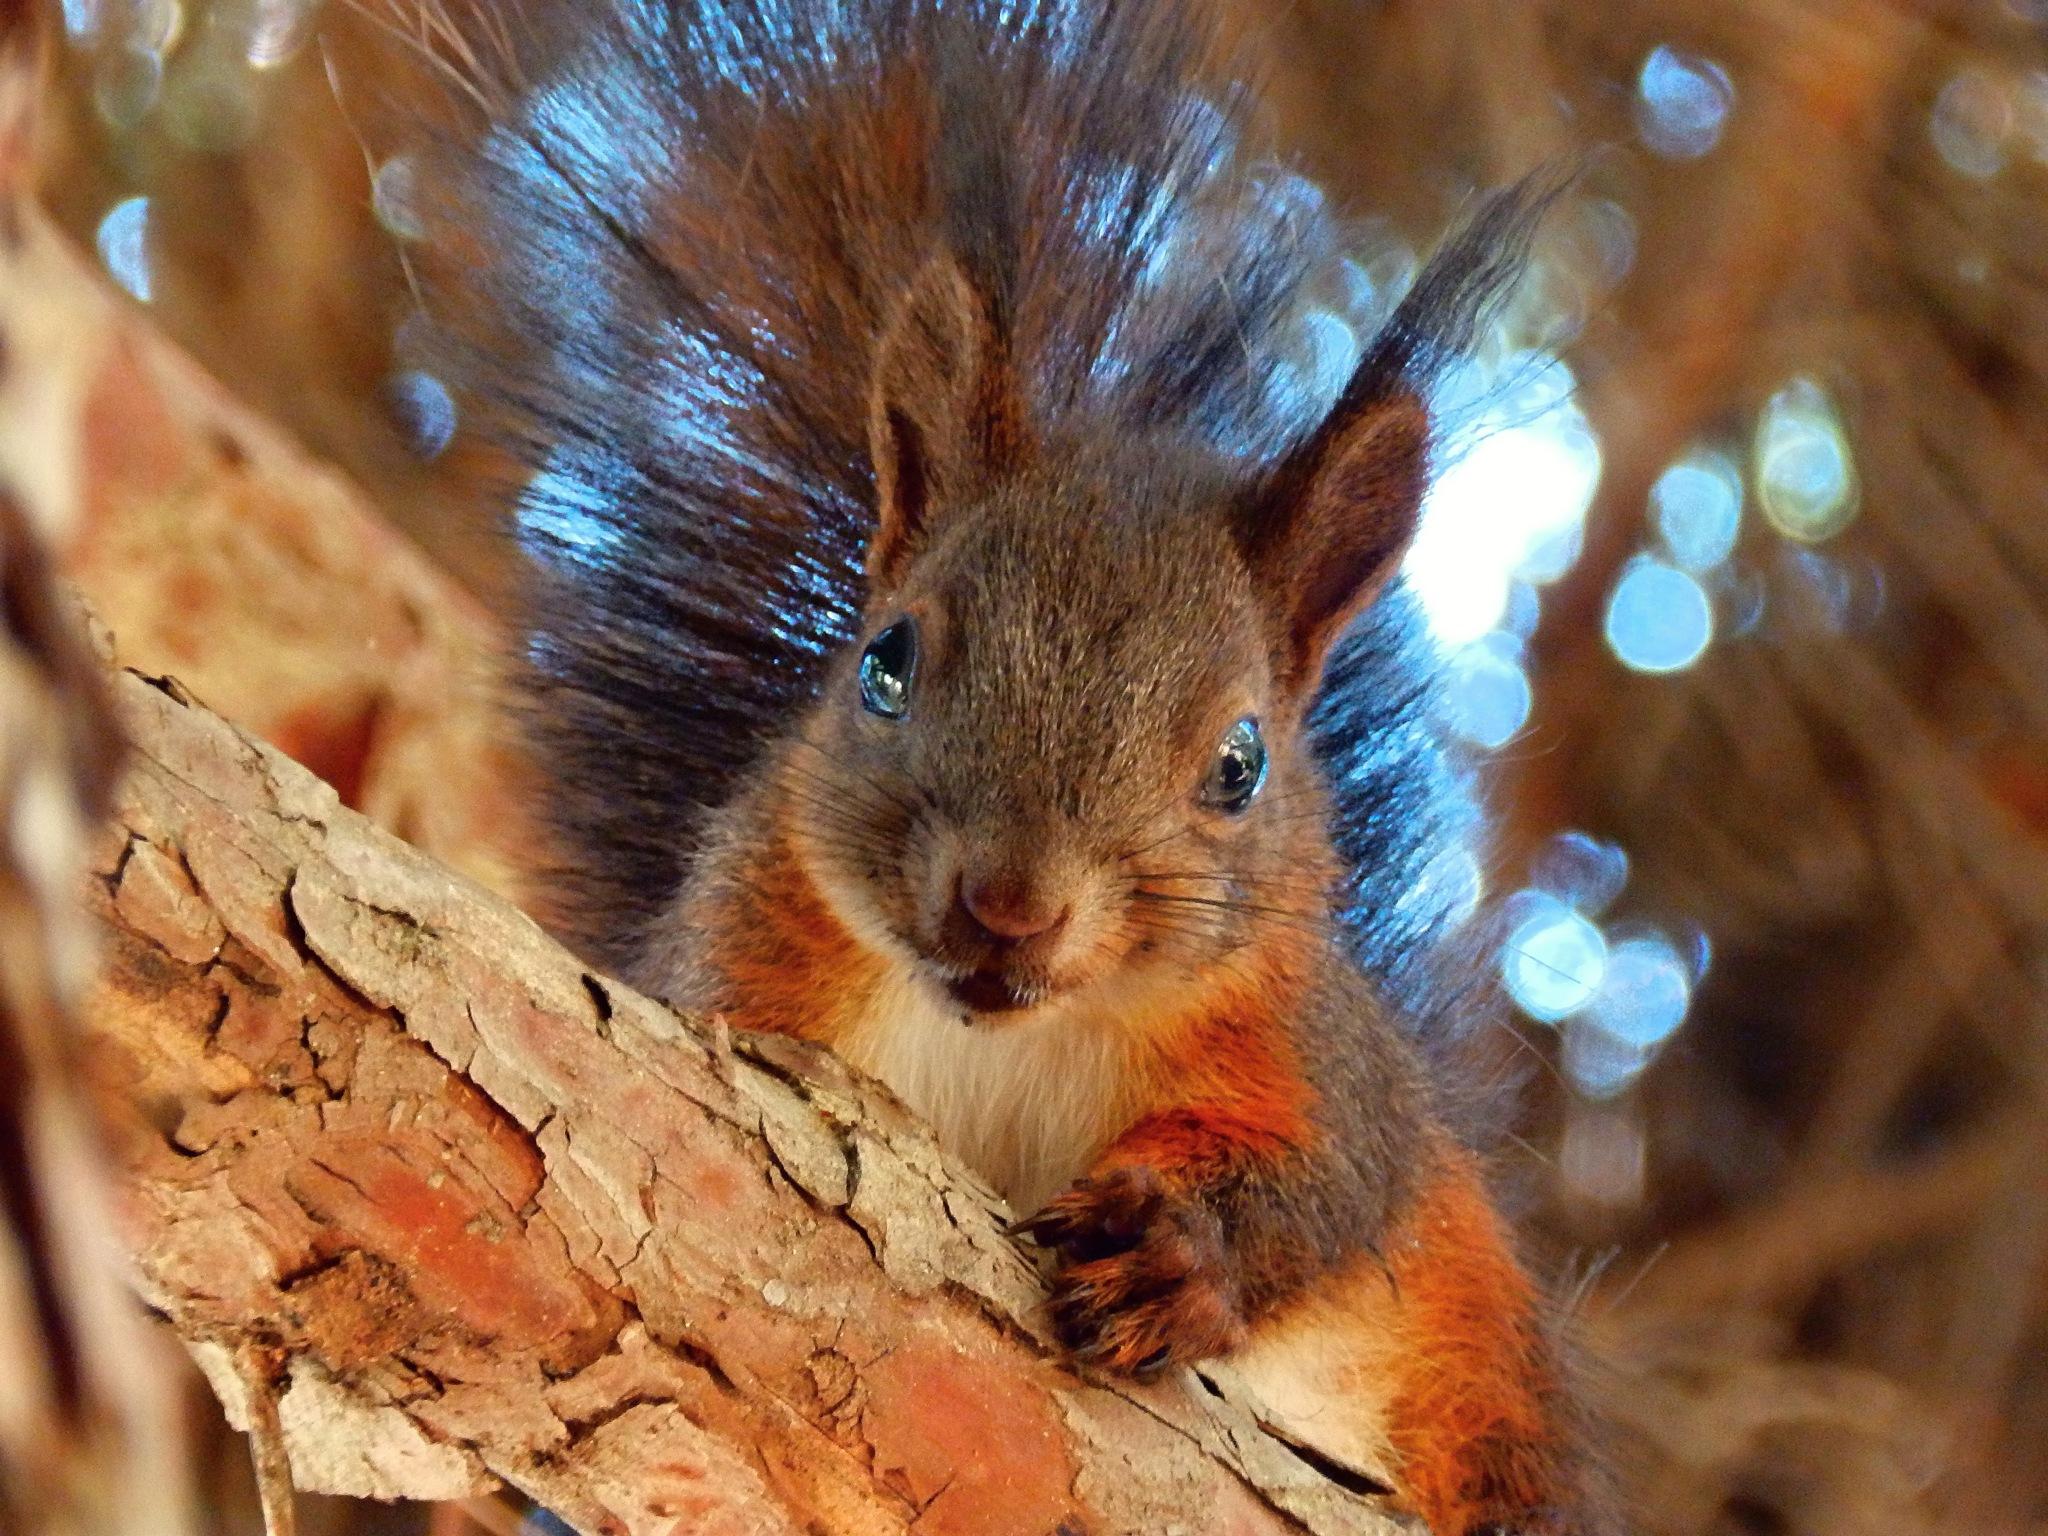 Squirrel by martin_sebesta_